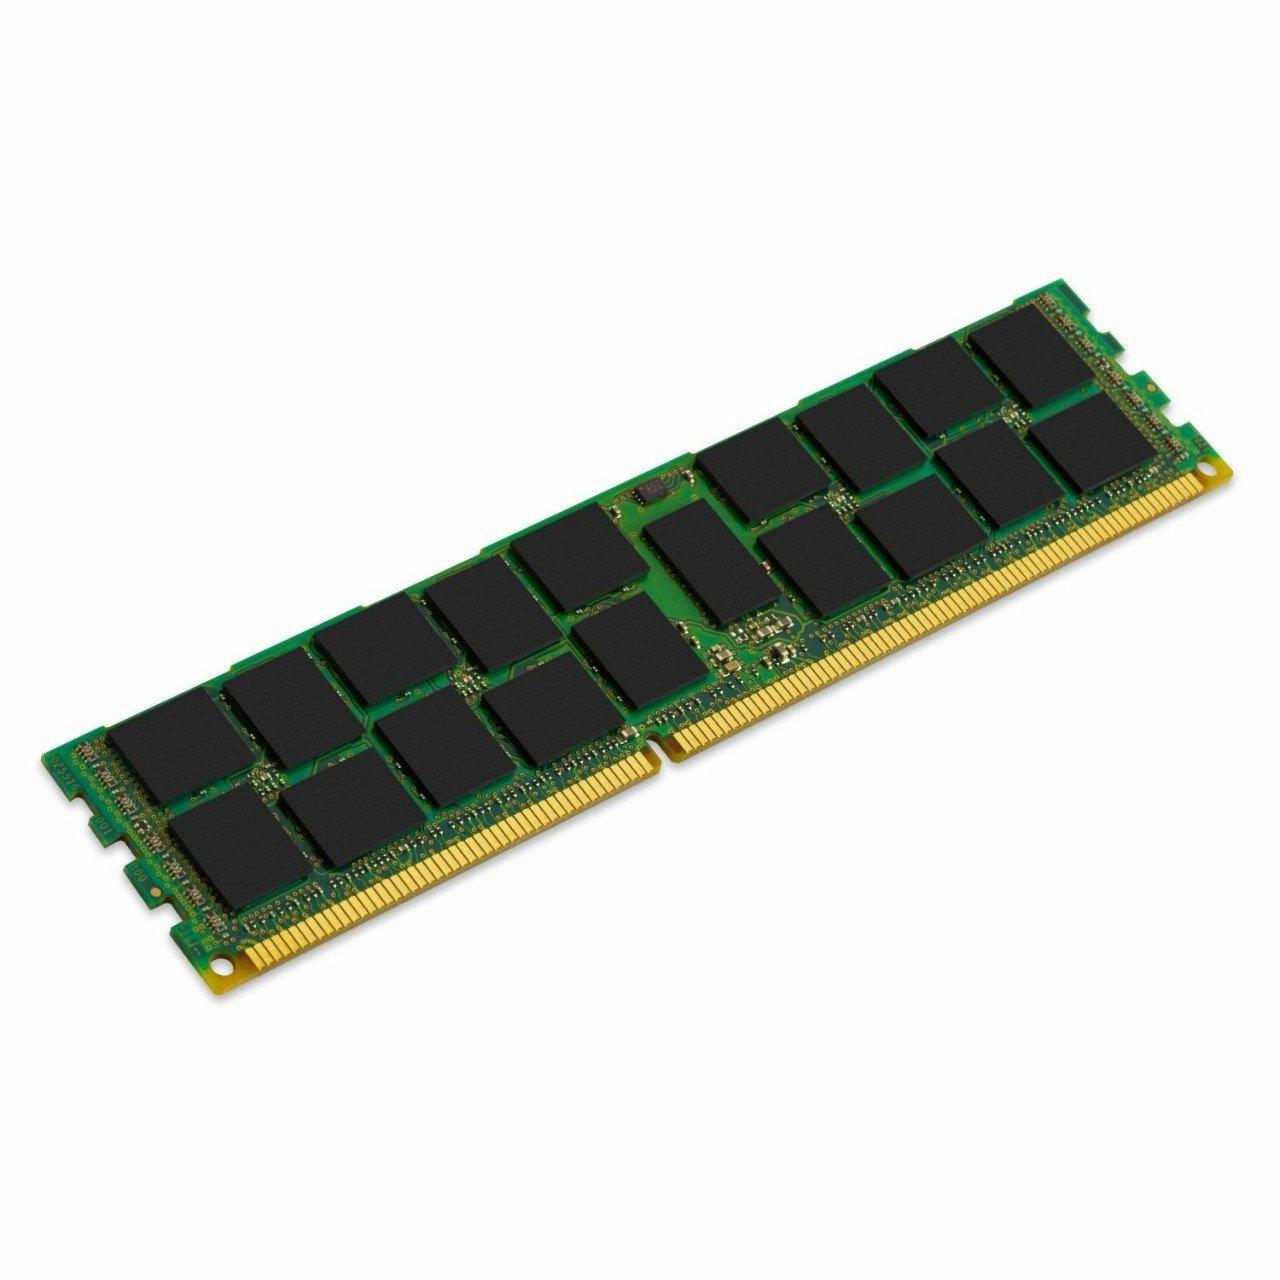 8GB 1600MHz DDR3 ECC Reg CL11 DIMM 2Rx8 Hynix B